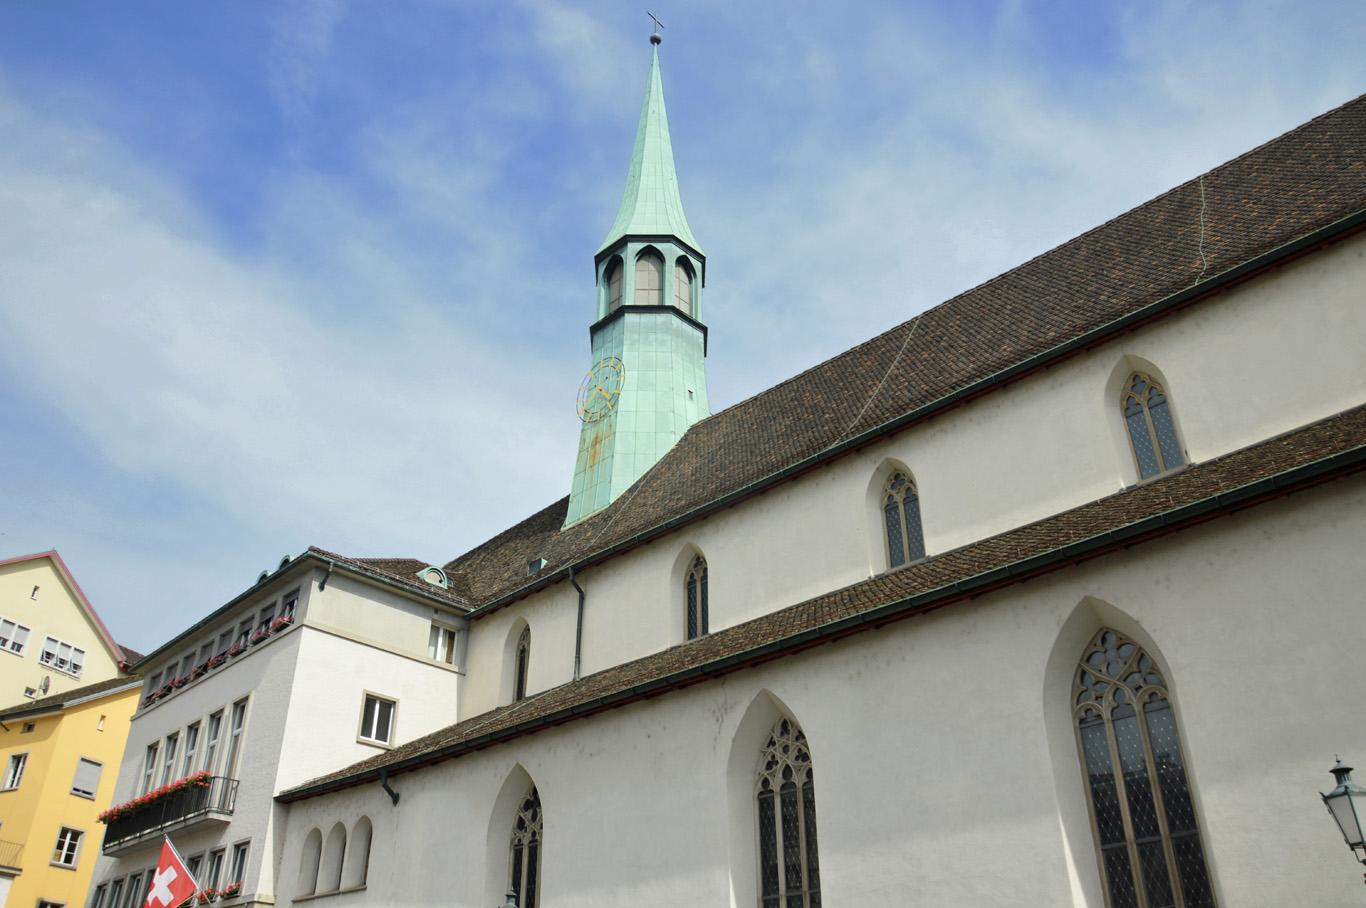 The Catholic Church in Zurich